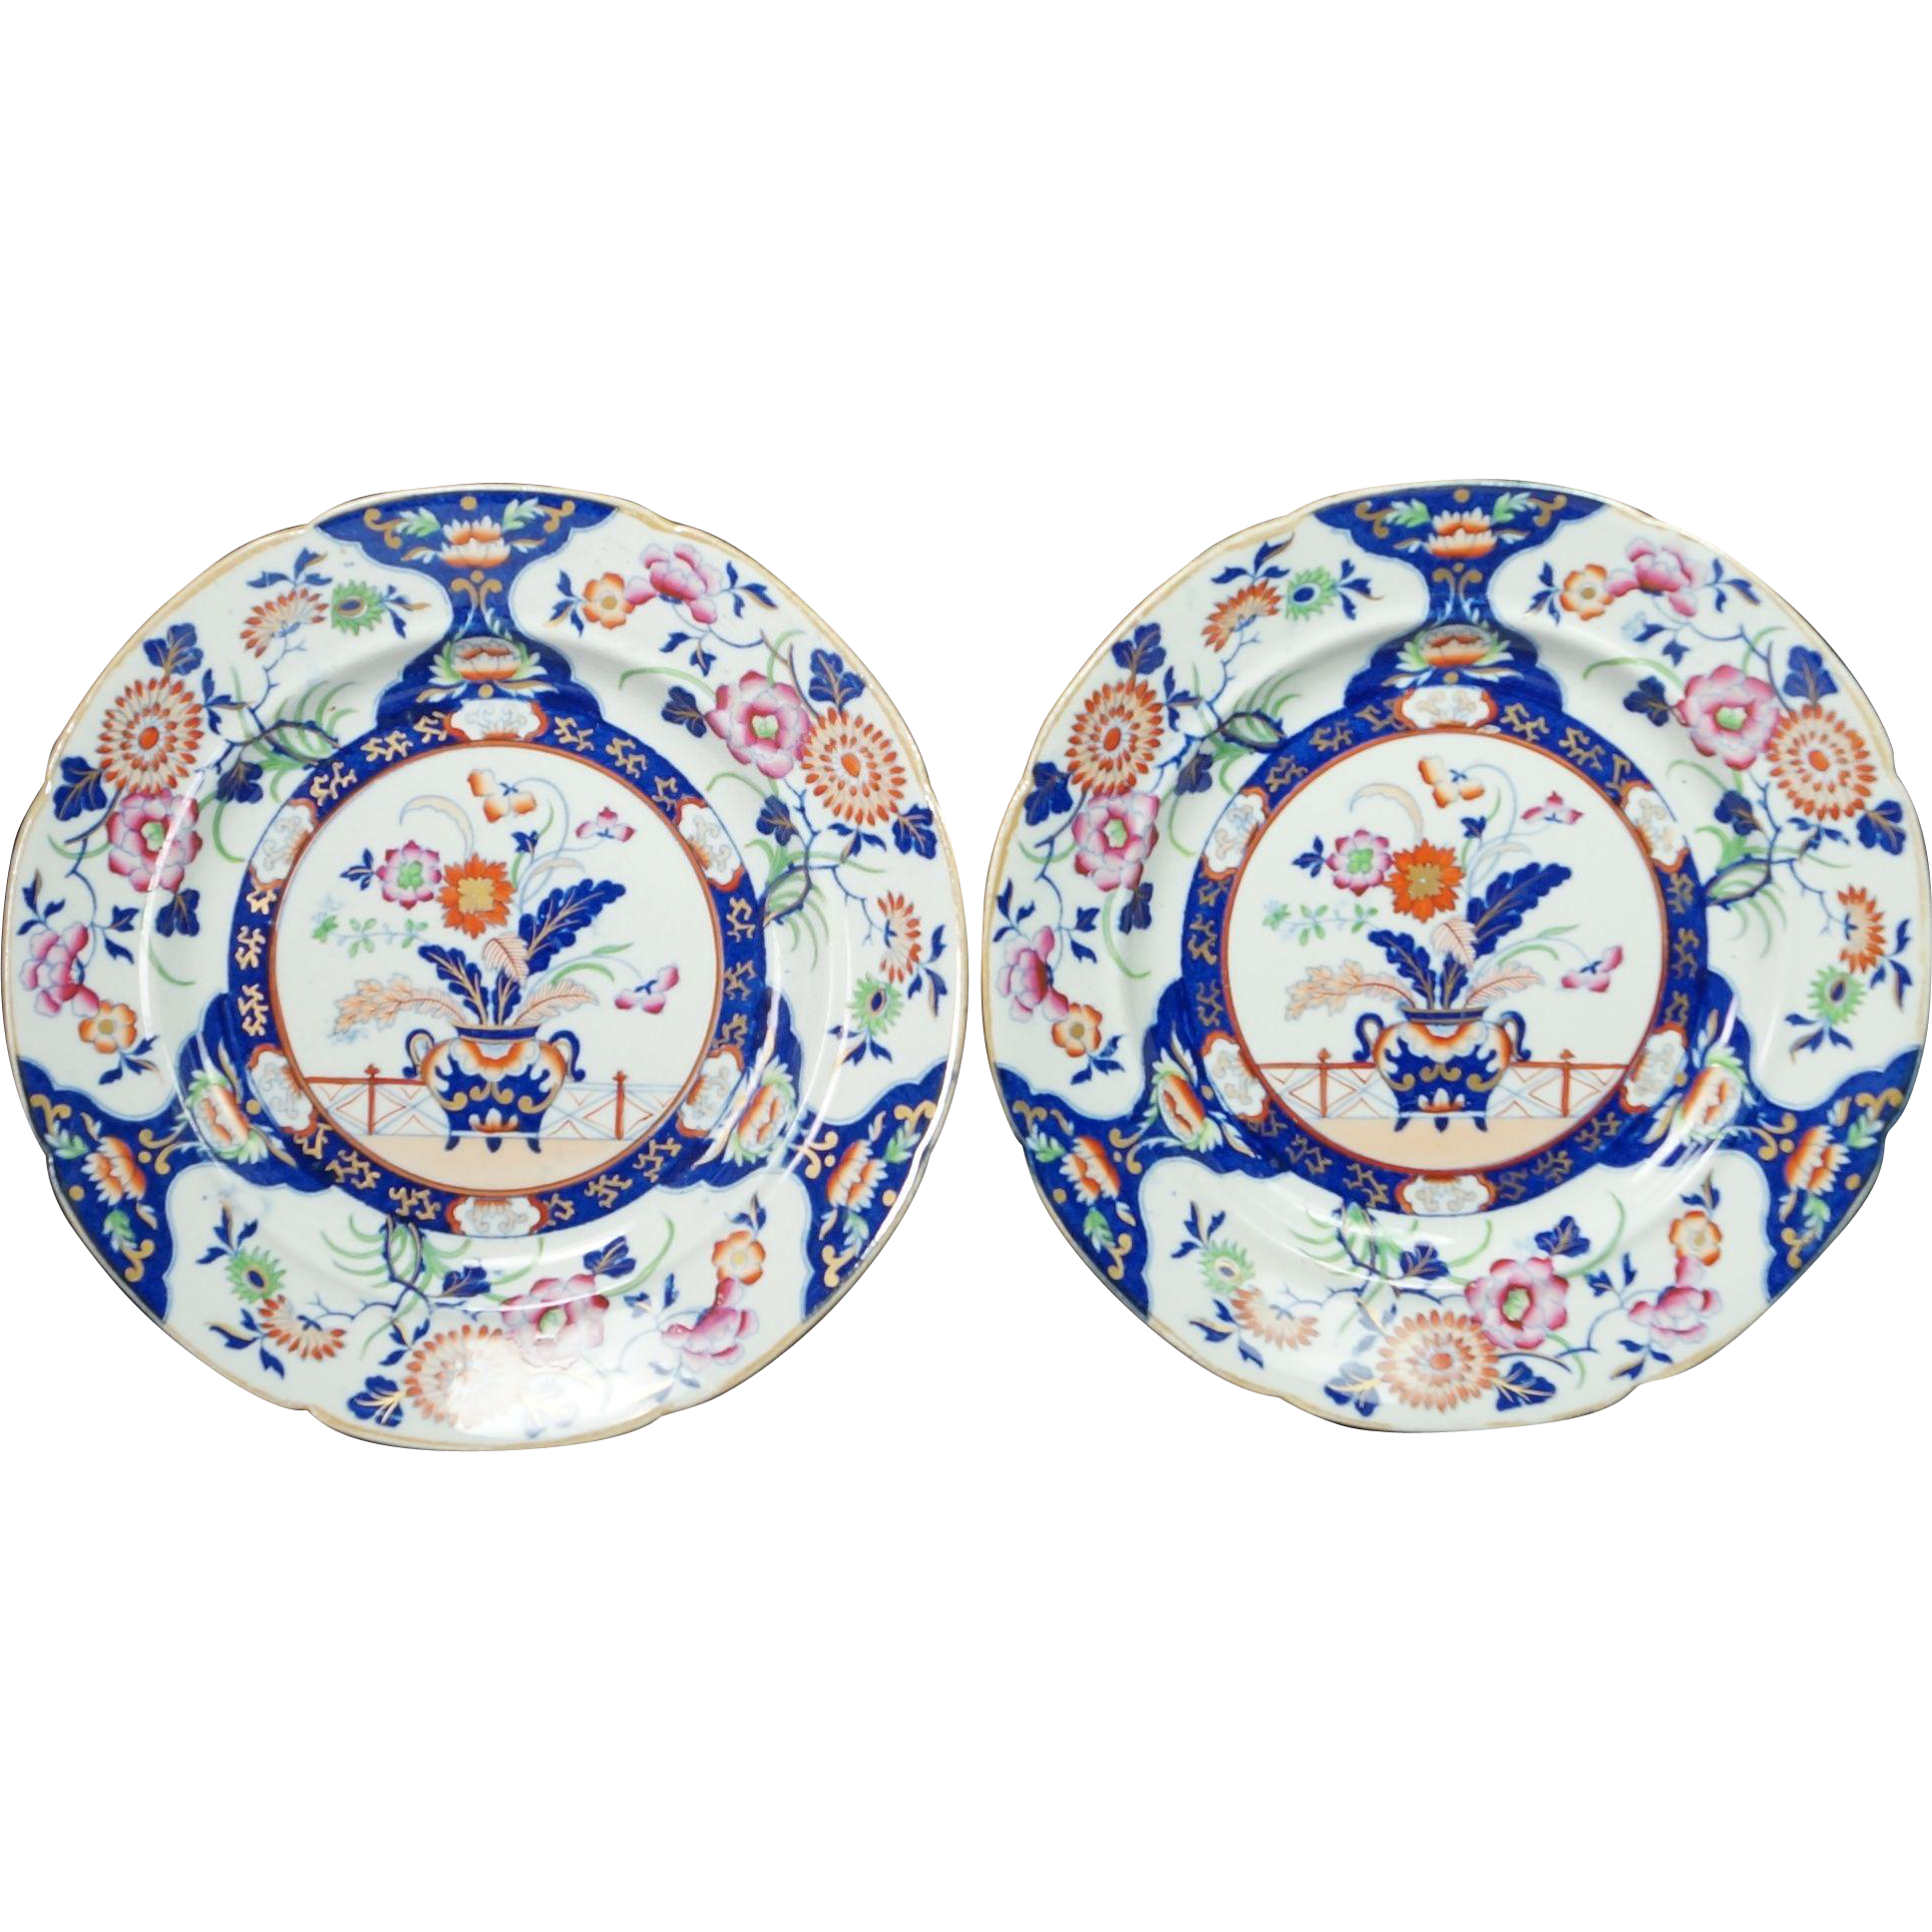 Antique 19th Century Masons Plates Circa 1850s